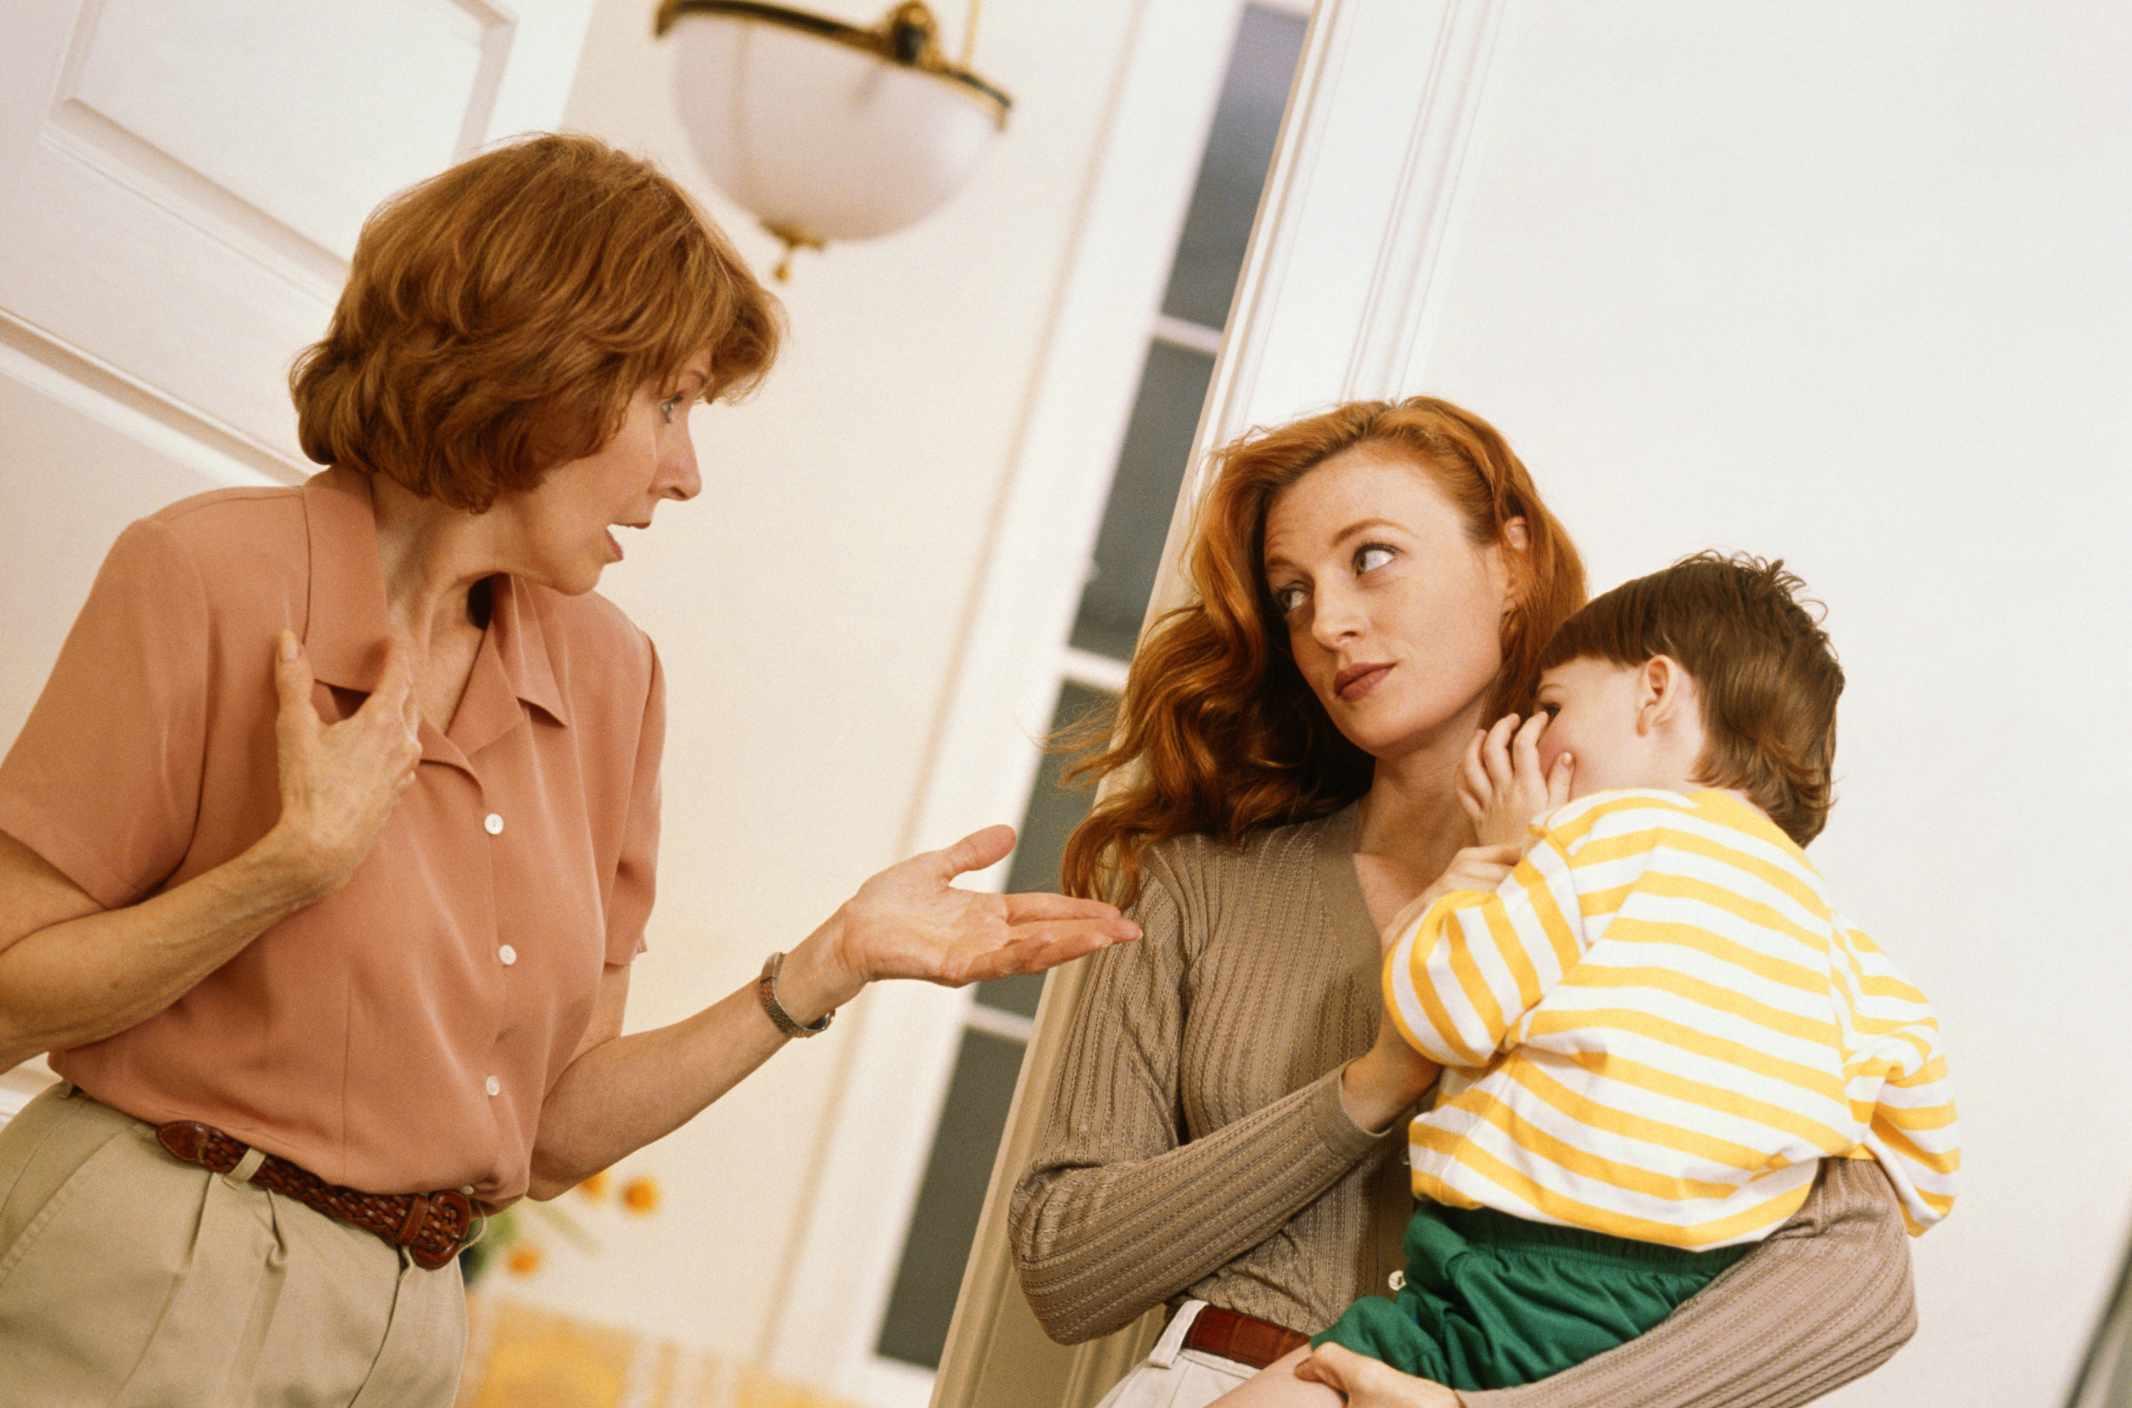 Grandmother judging daughter's parenting